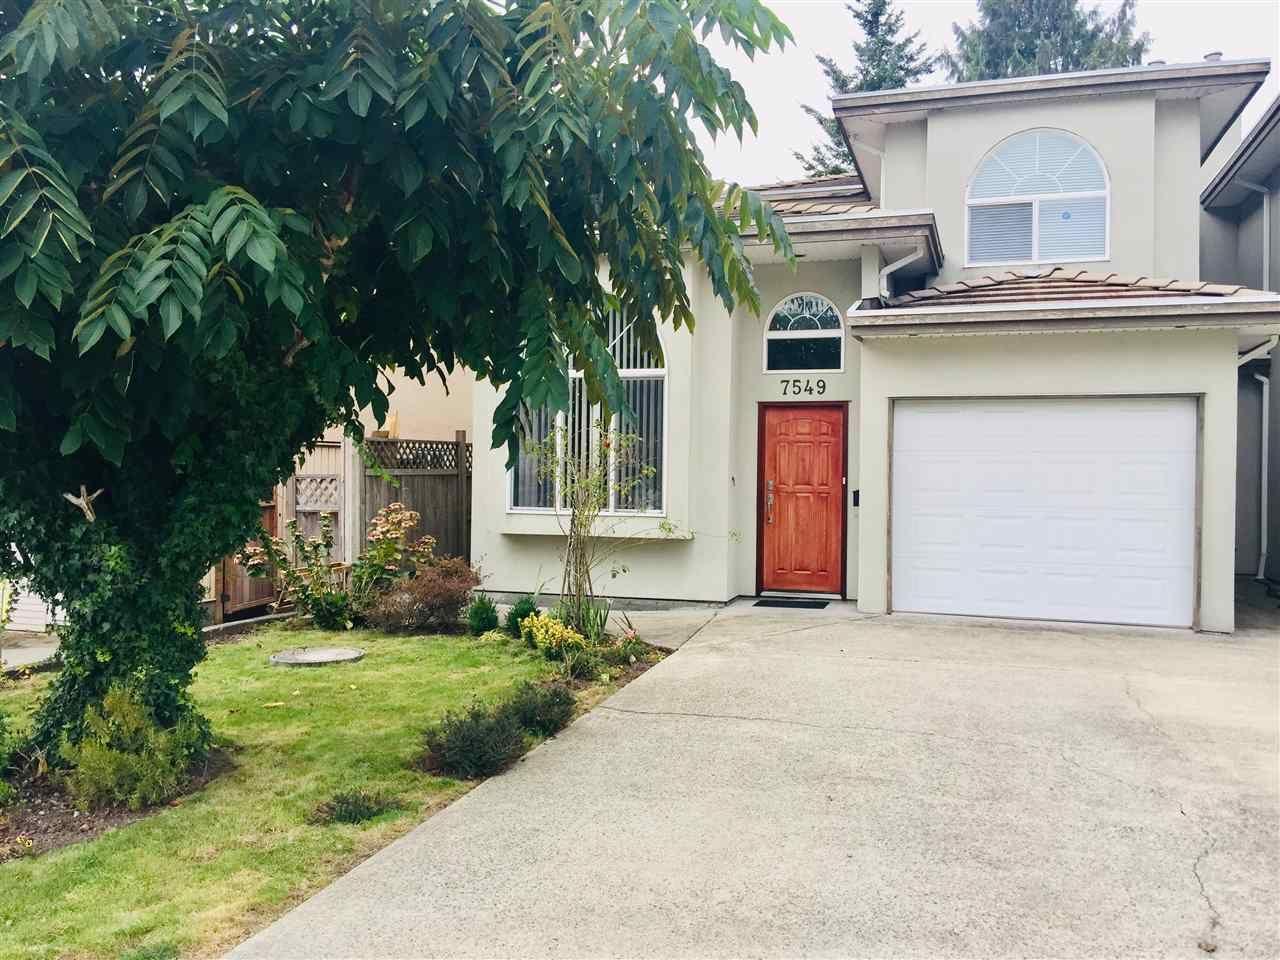 Main Photo: 7549 16TH AVENUE in : Edmonds BE 1/2 Duplex for sale : MLS®# R2420057